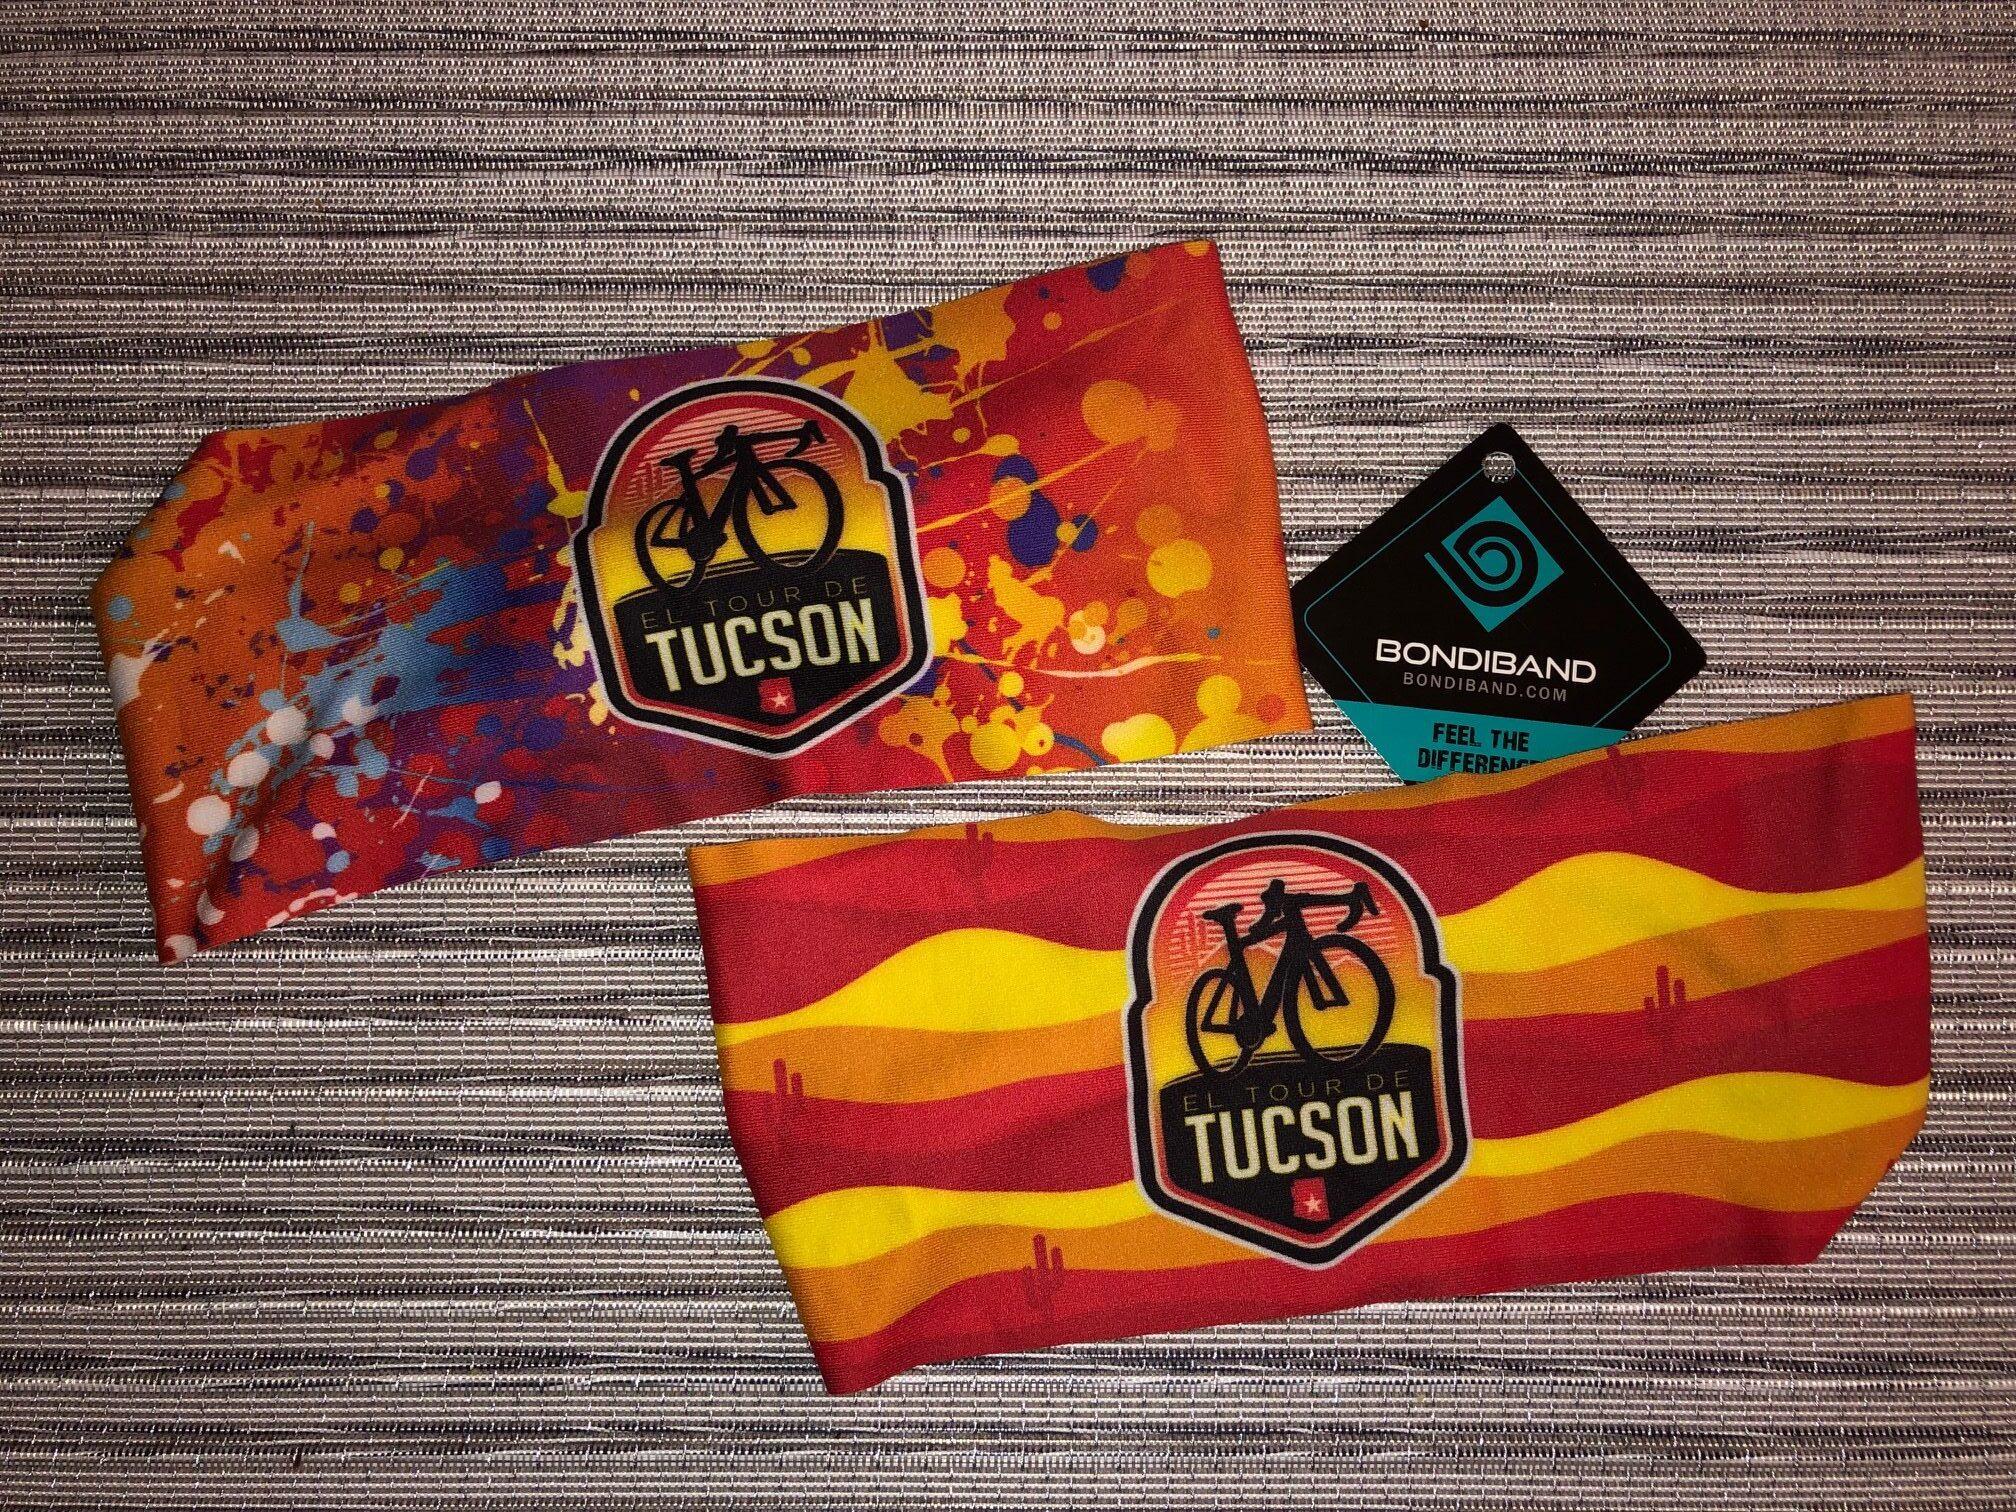 El Tour BondiBand Moisture Wicking Headband – 2 Pack